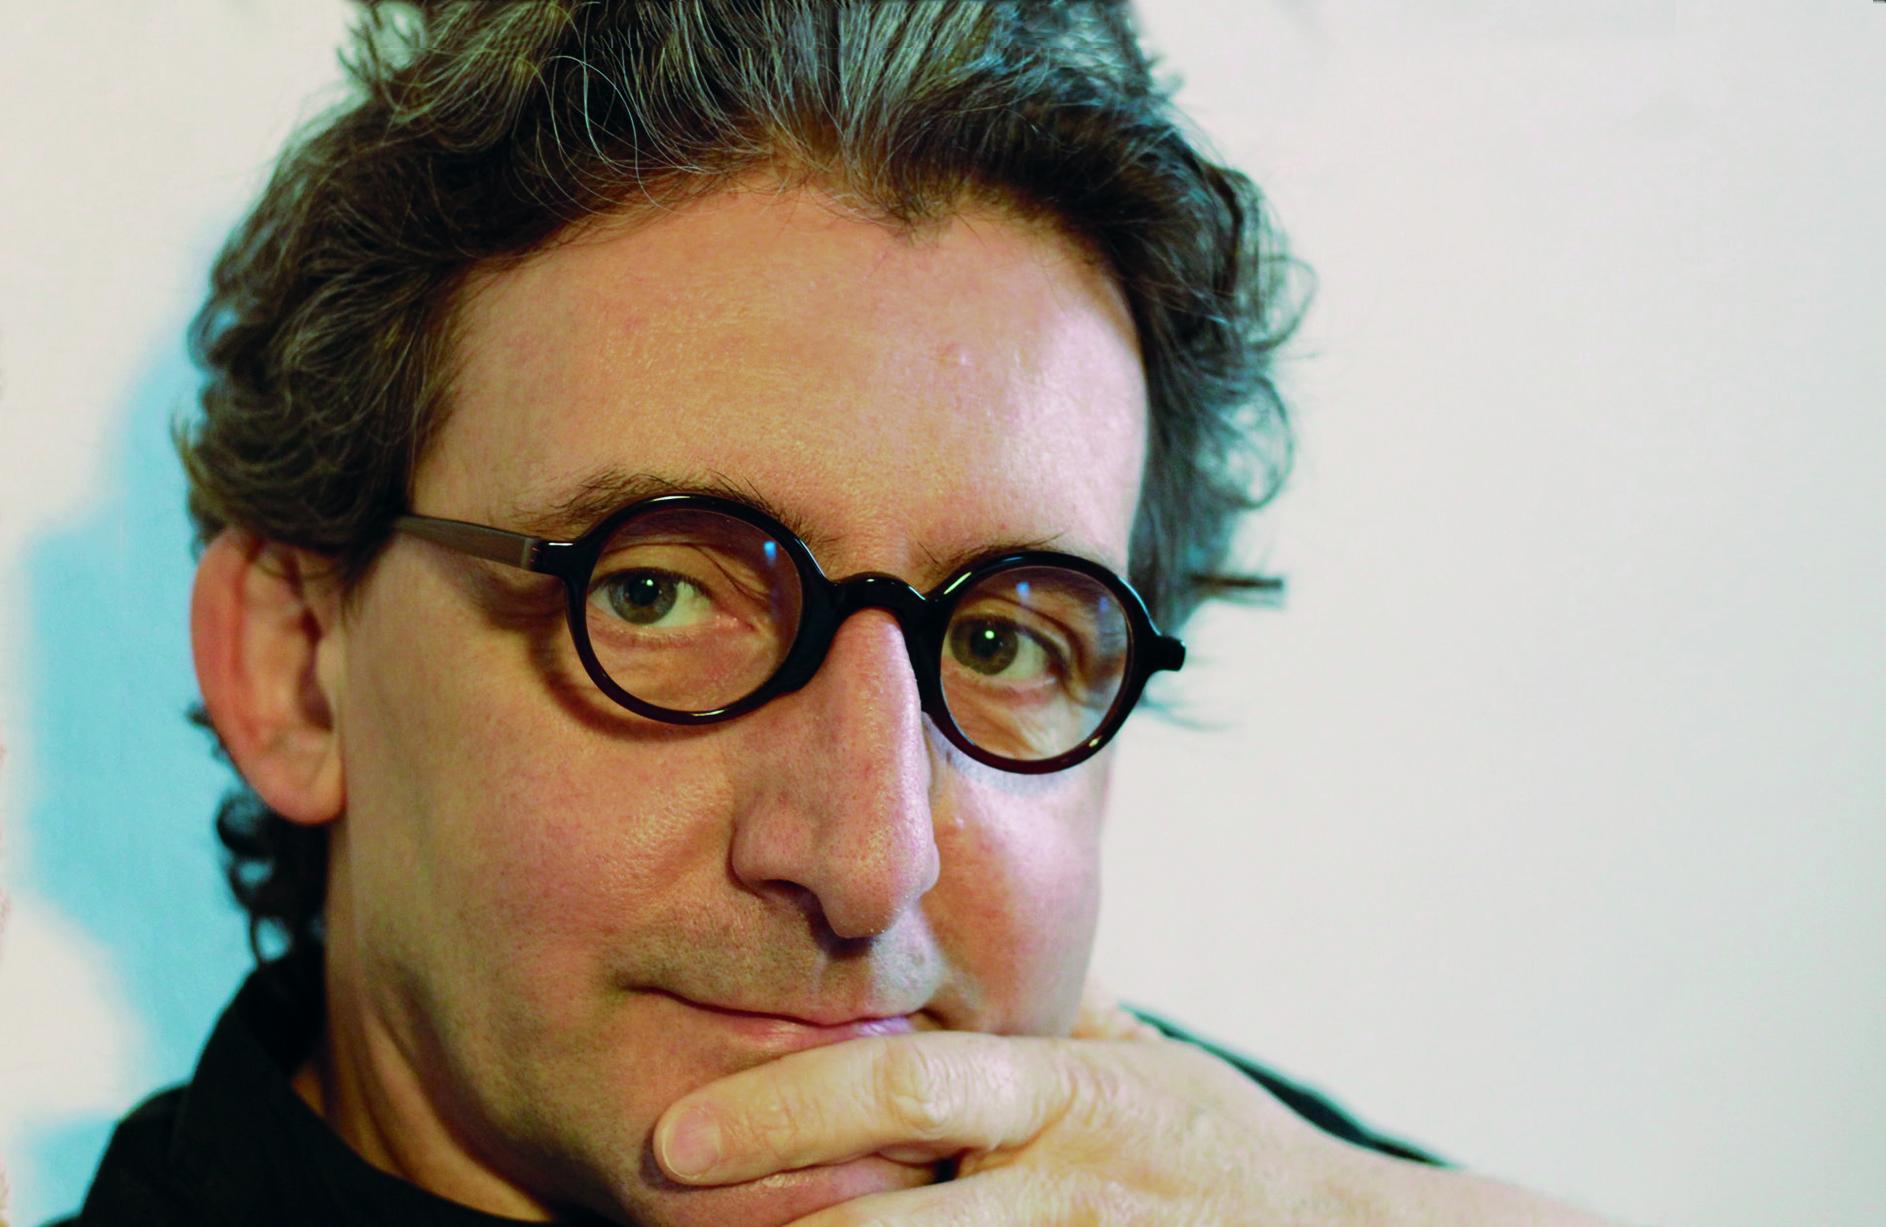 Claudio Osele